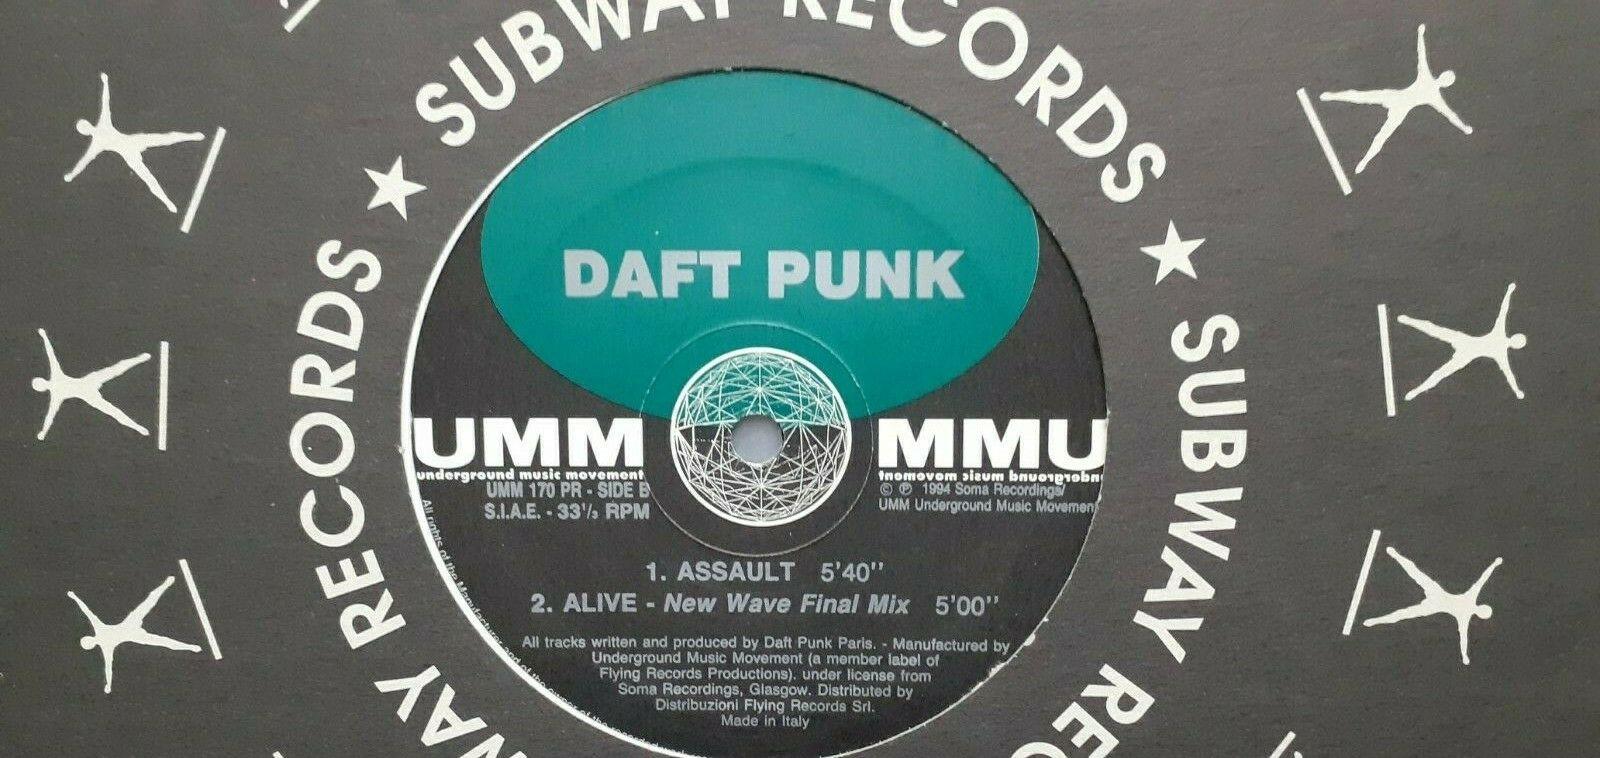 Daft Punk    The New Wave UMM        UMM 170 PR mix 12  record 1994